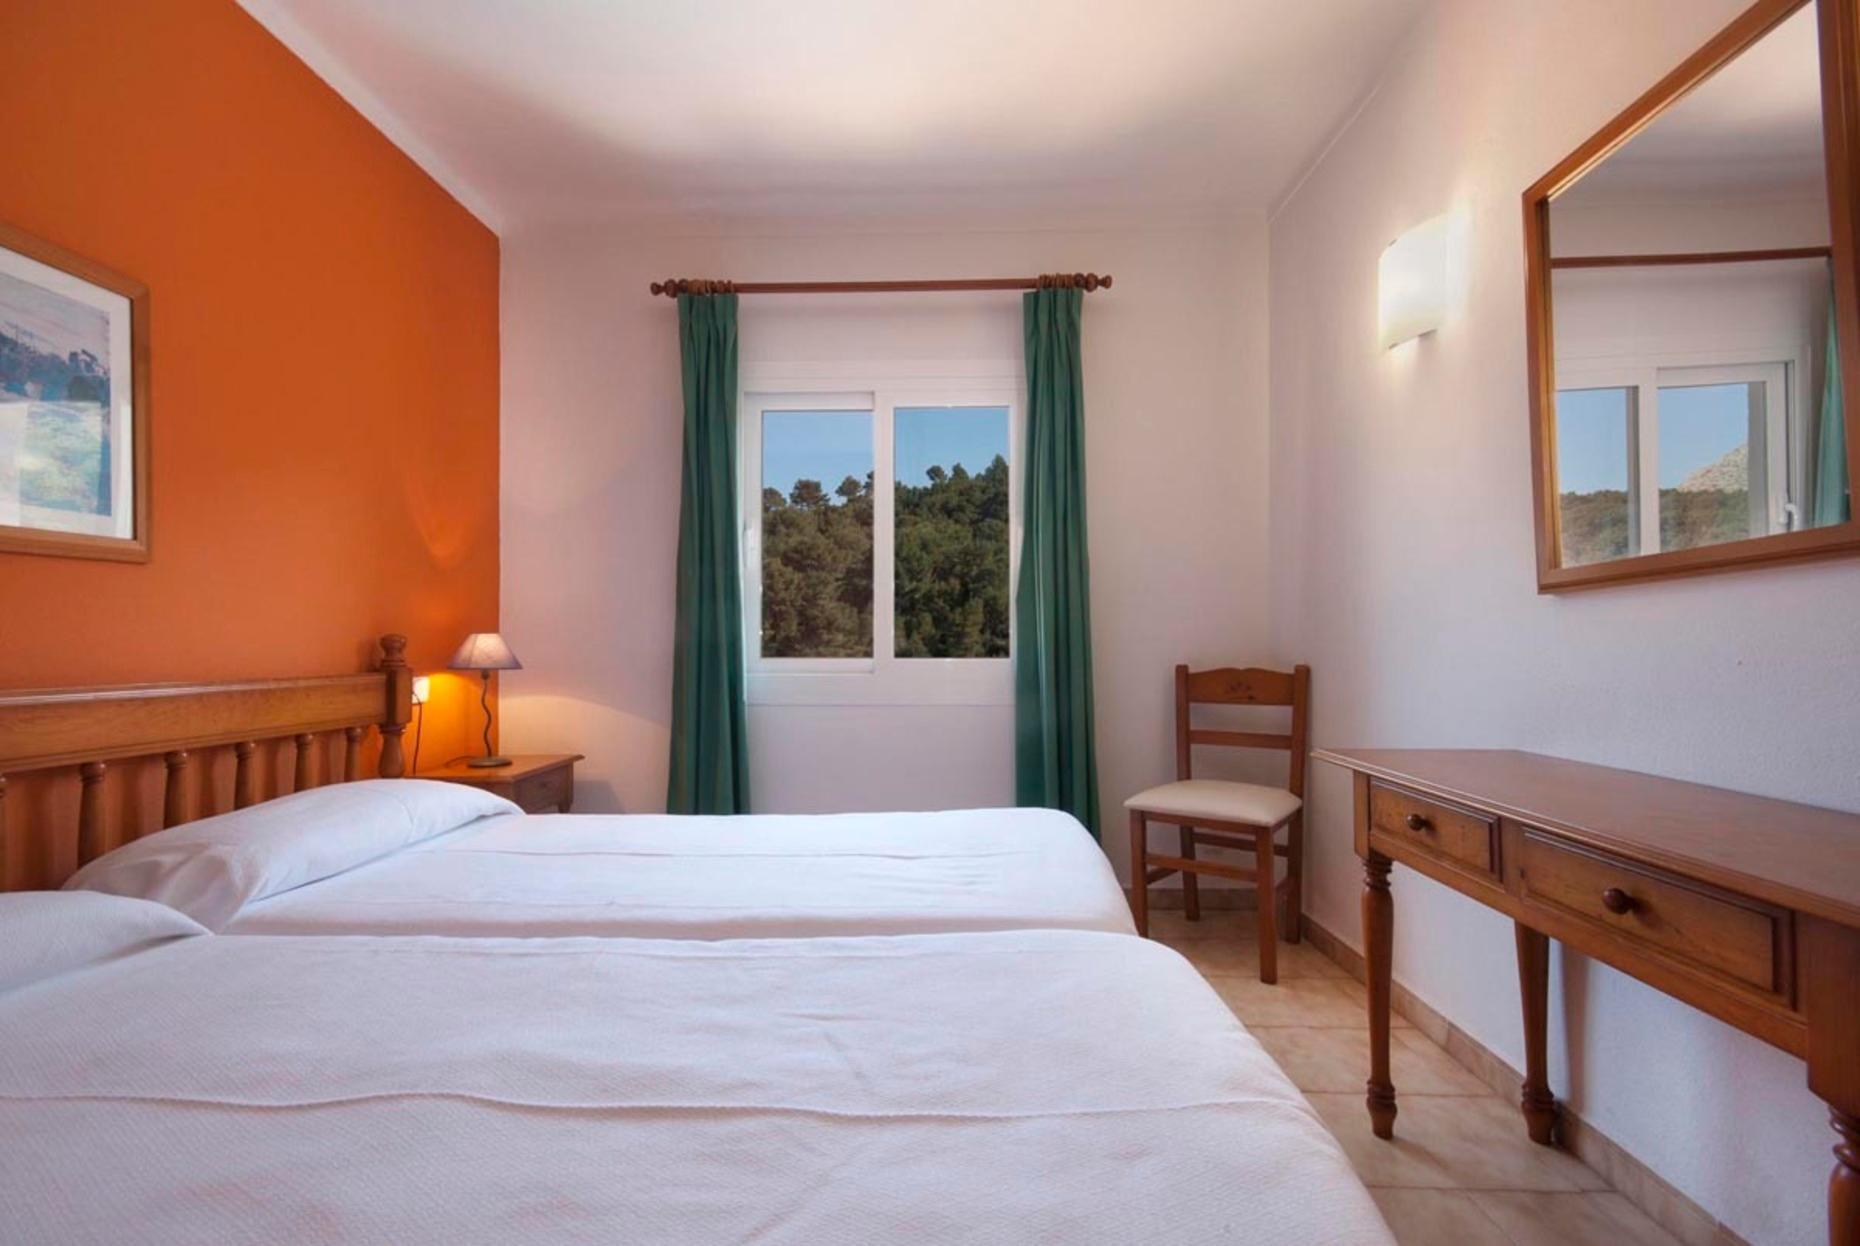 103218 -  Apartment in Cala Sant Vicenç